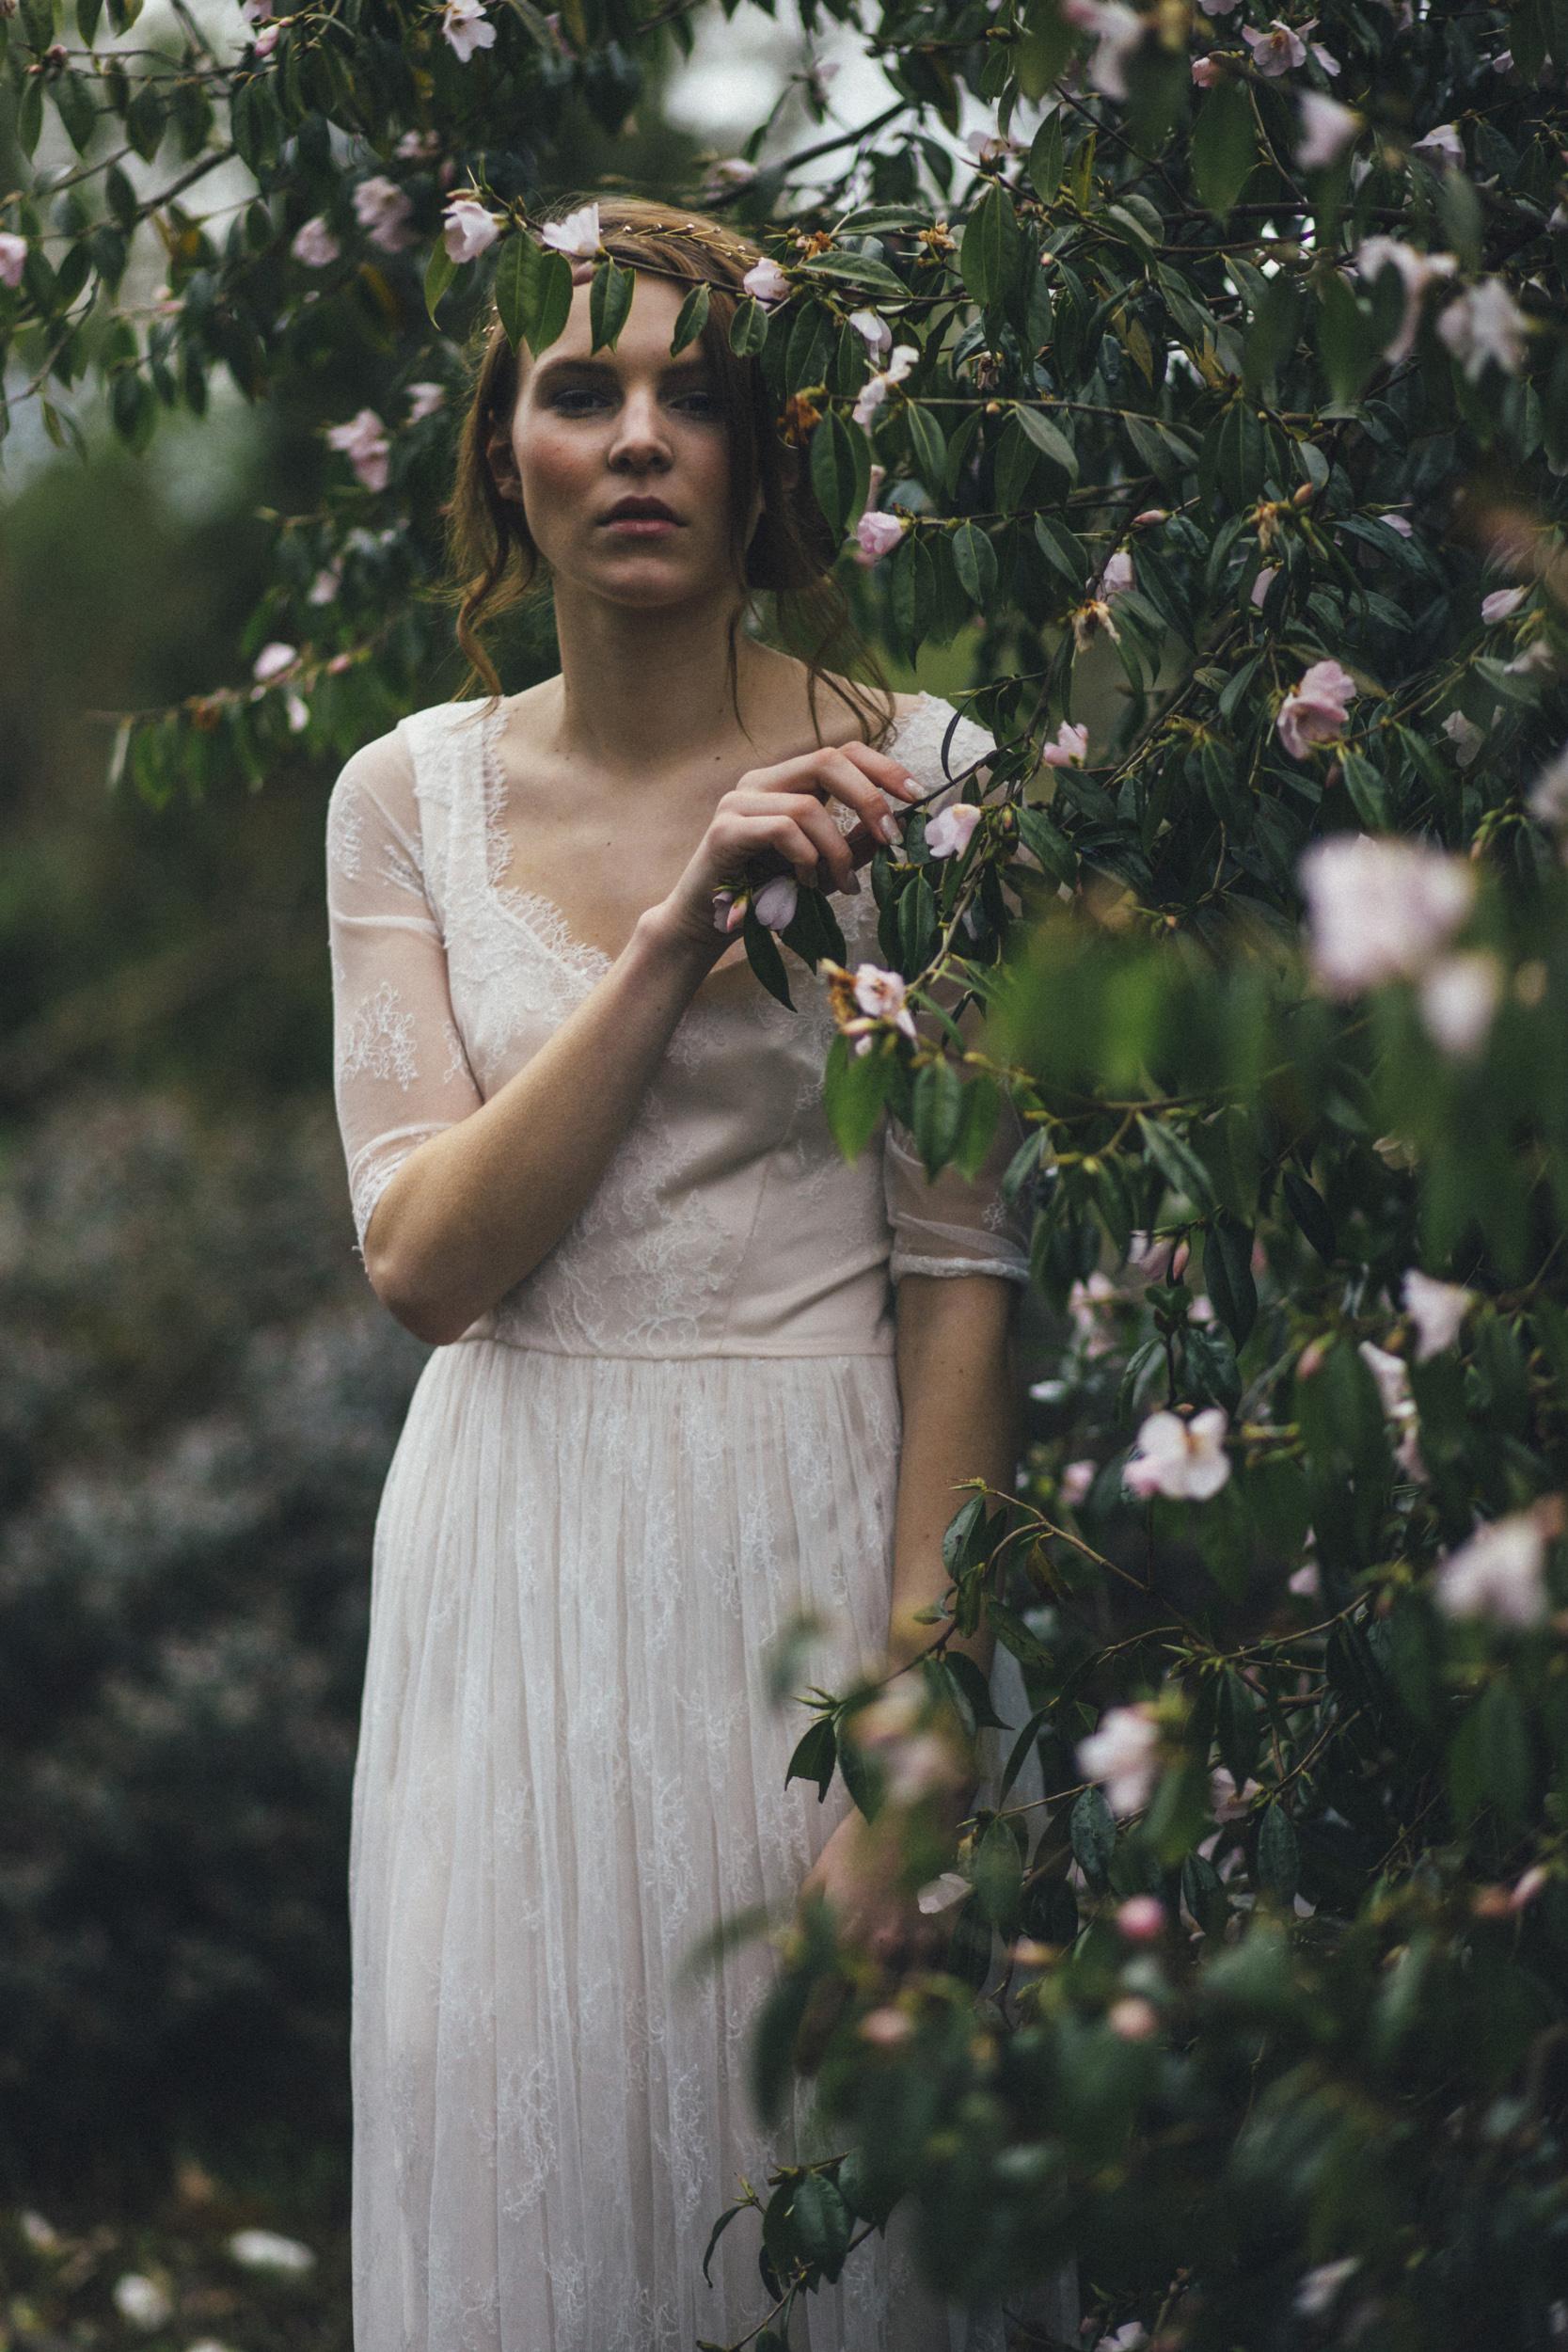 Spring-Bridal-Kate-Beaumont-Shelley-Richmond-Vintage-Wedding-Dress-7.jpg